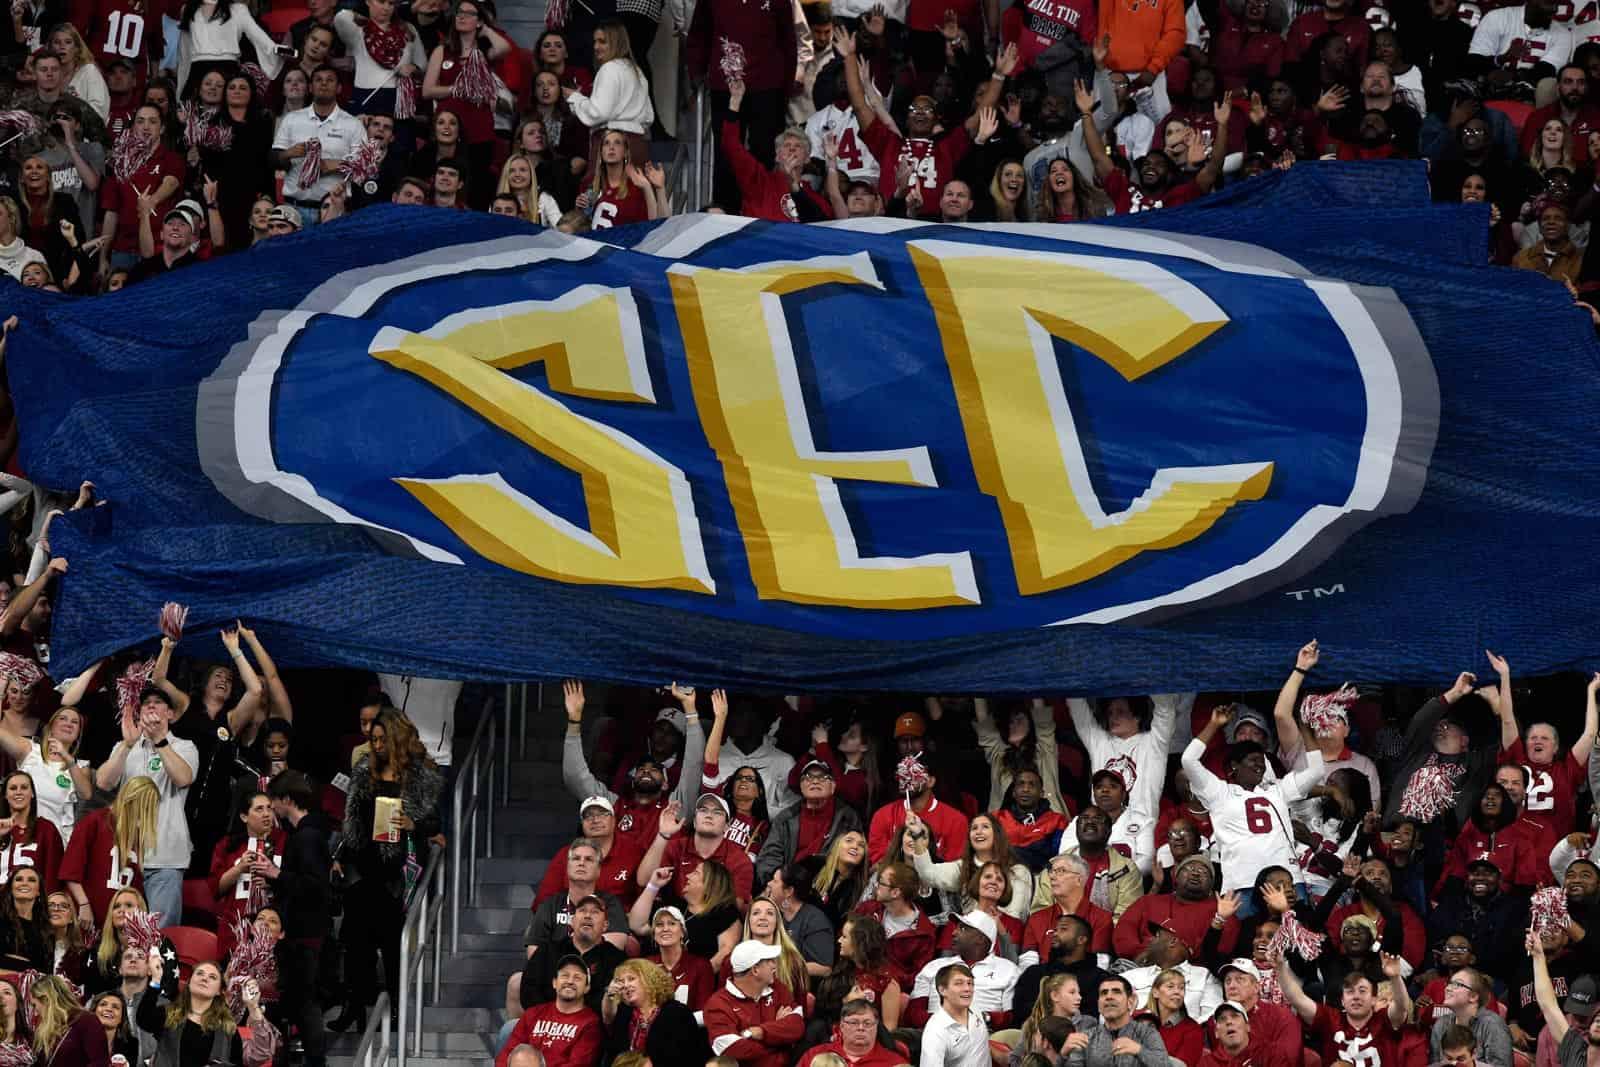 2019 SEC Championship Game